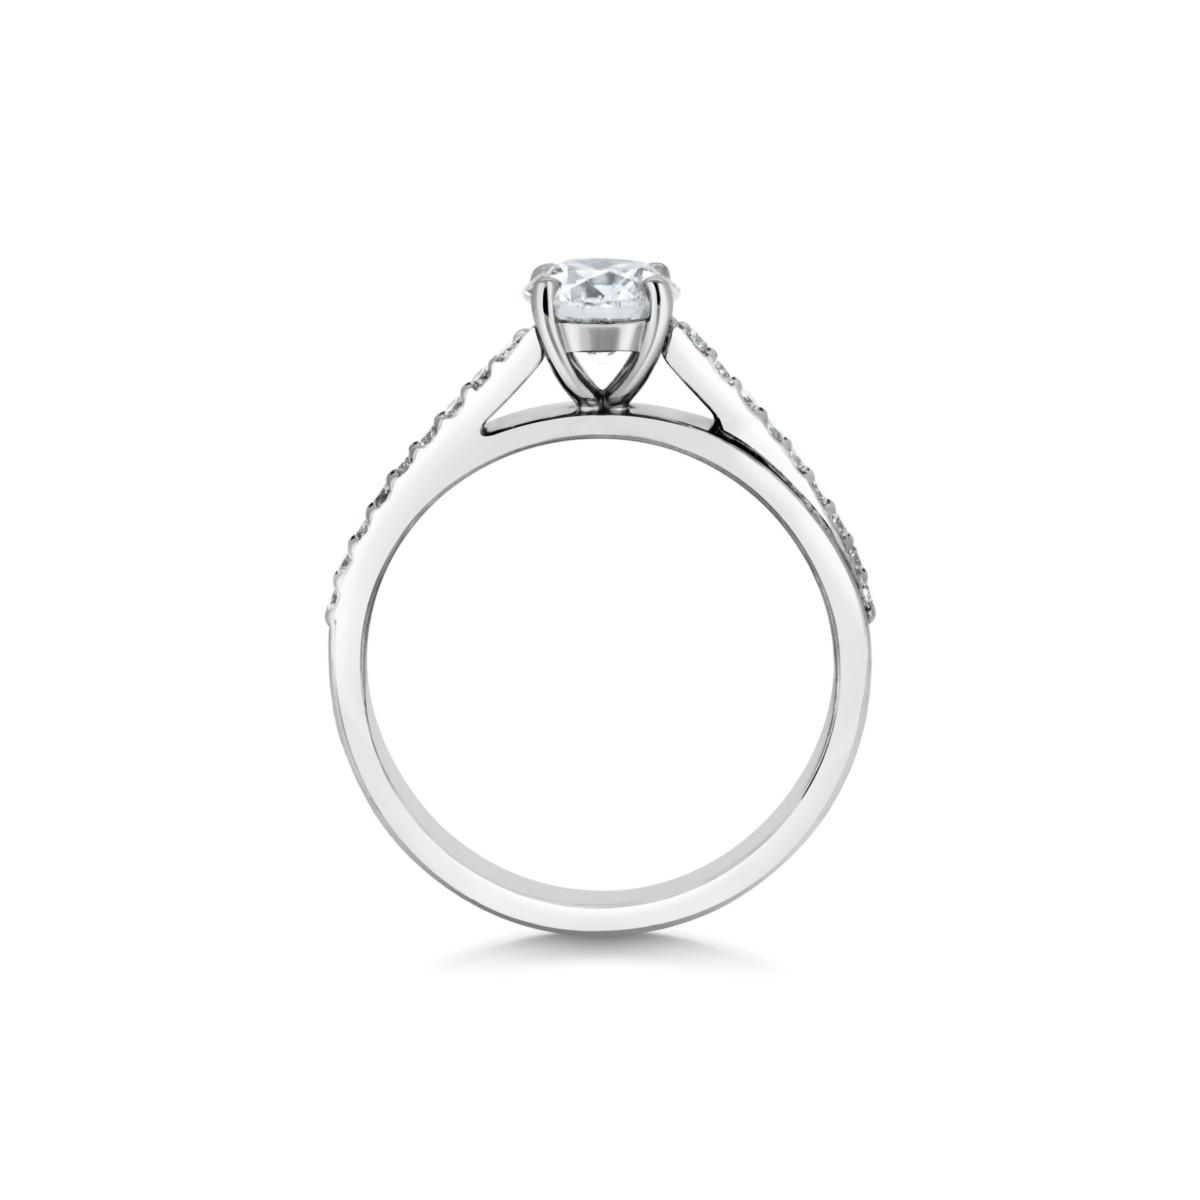 Sephora Round Cut Diamond Microset Engagement Ring Side View